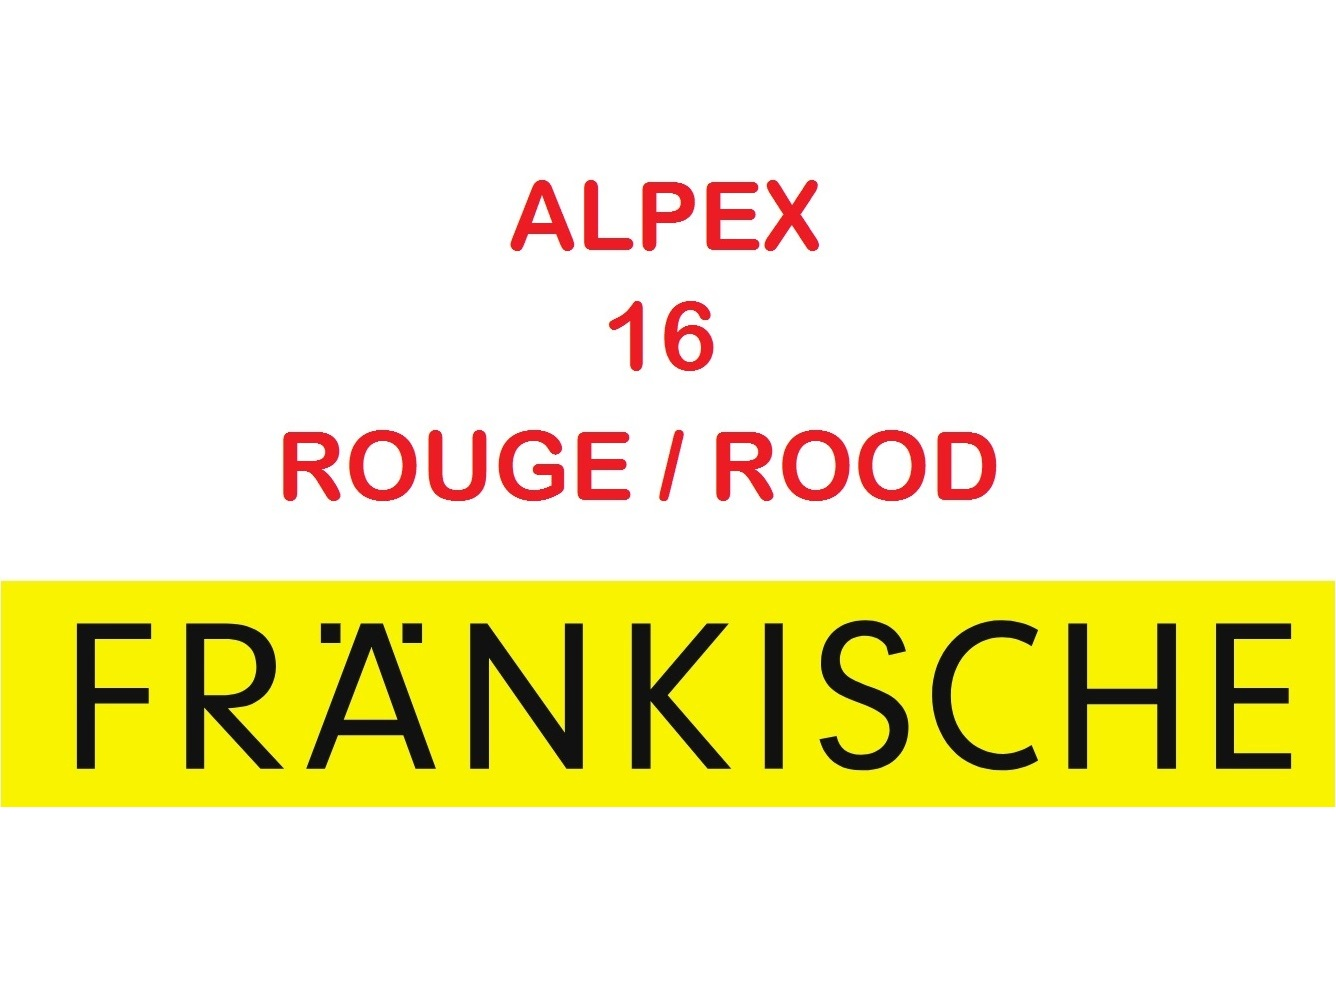 Multicouche Alpex 16x2 50 m GAINE ROUGE